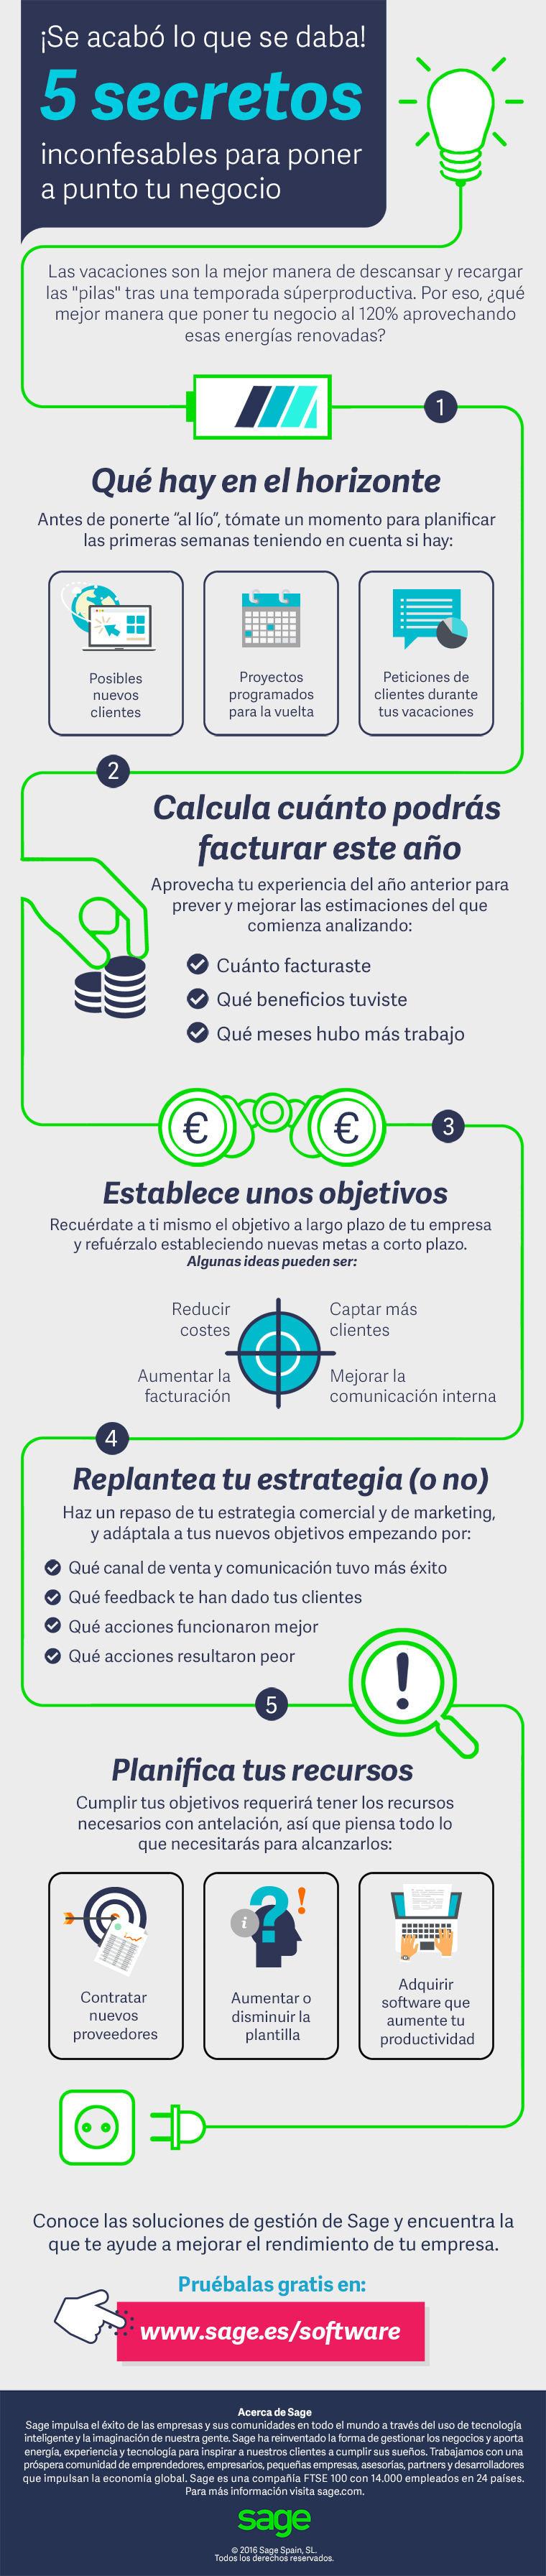 5 secretos para activar tu empresa después de las vacaciones #infografia #infographic #rrhh